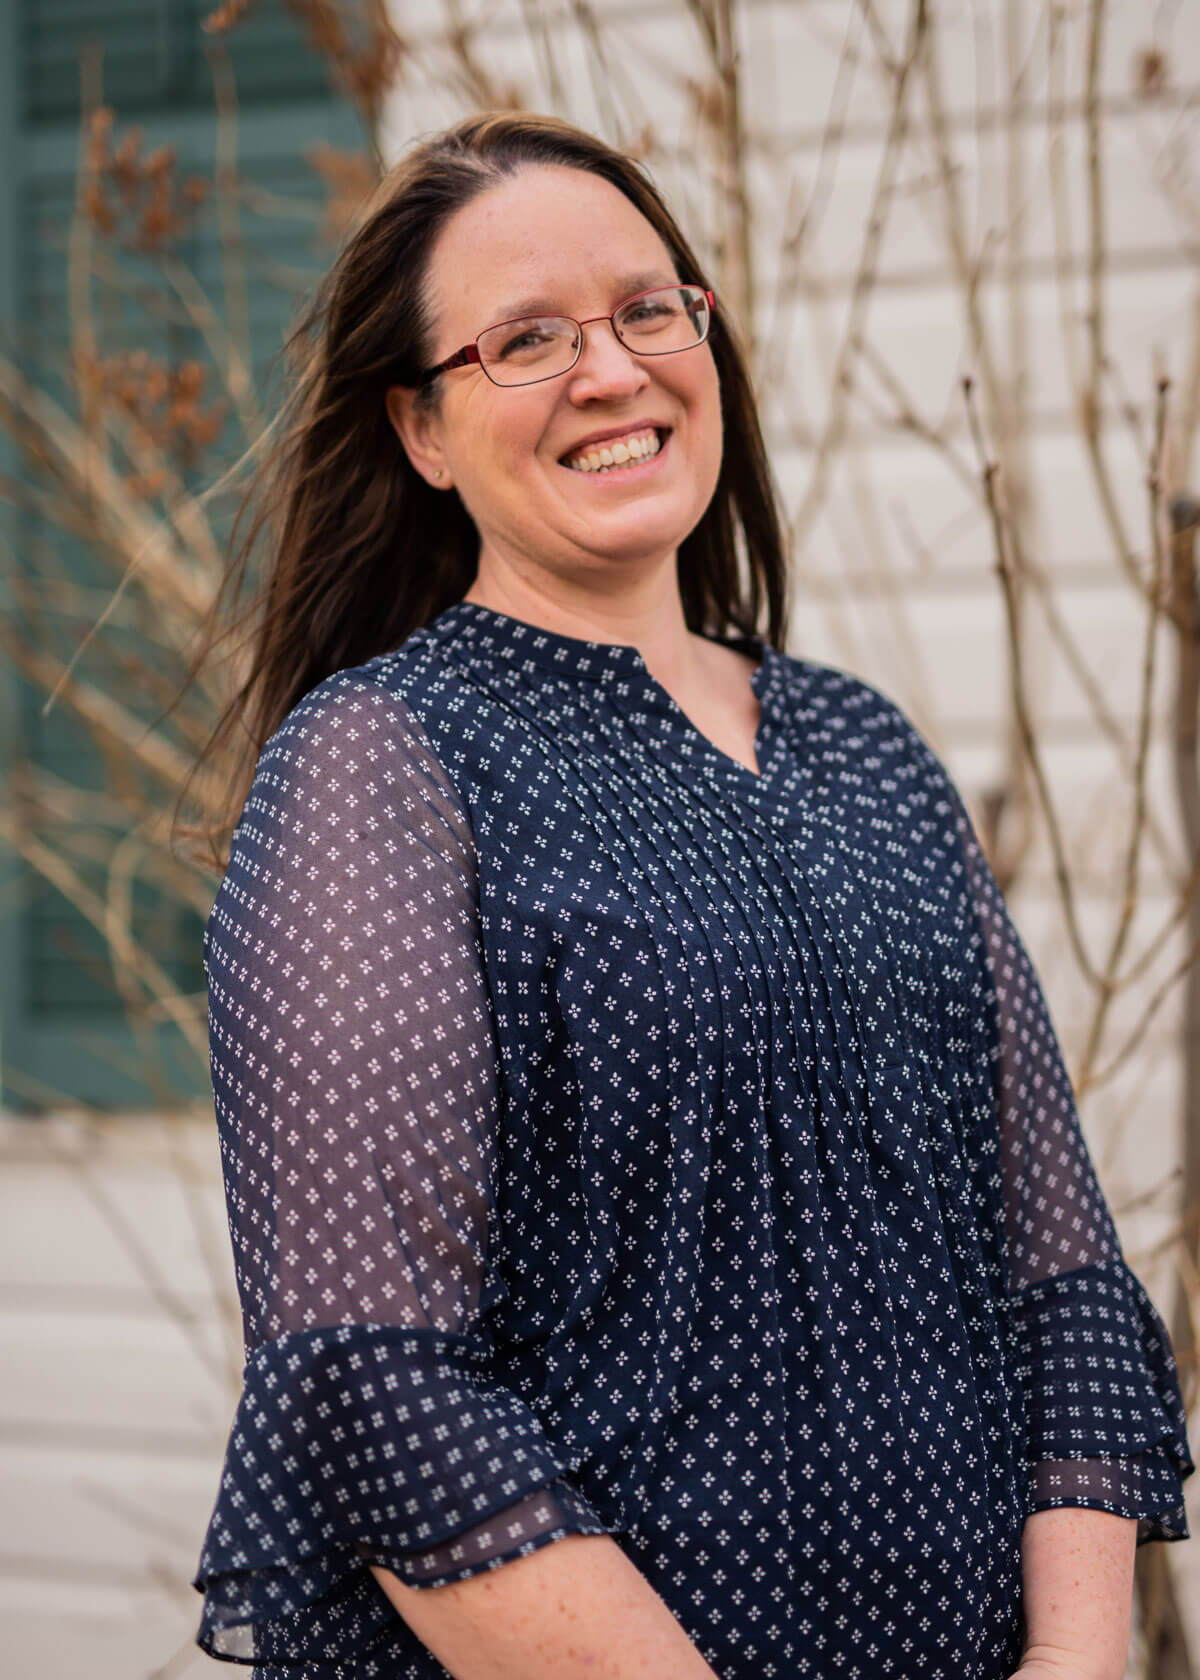 Dr. Kristin Astrom - Pinnacle Medical Group